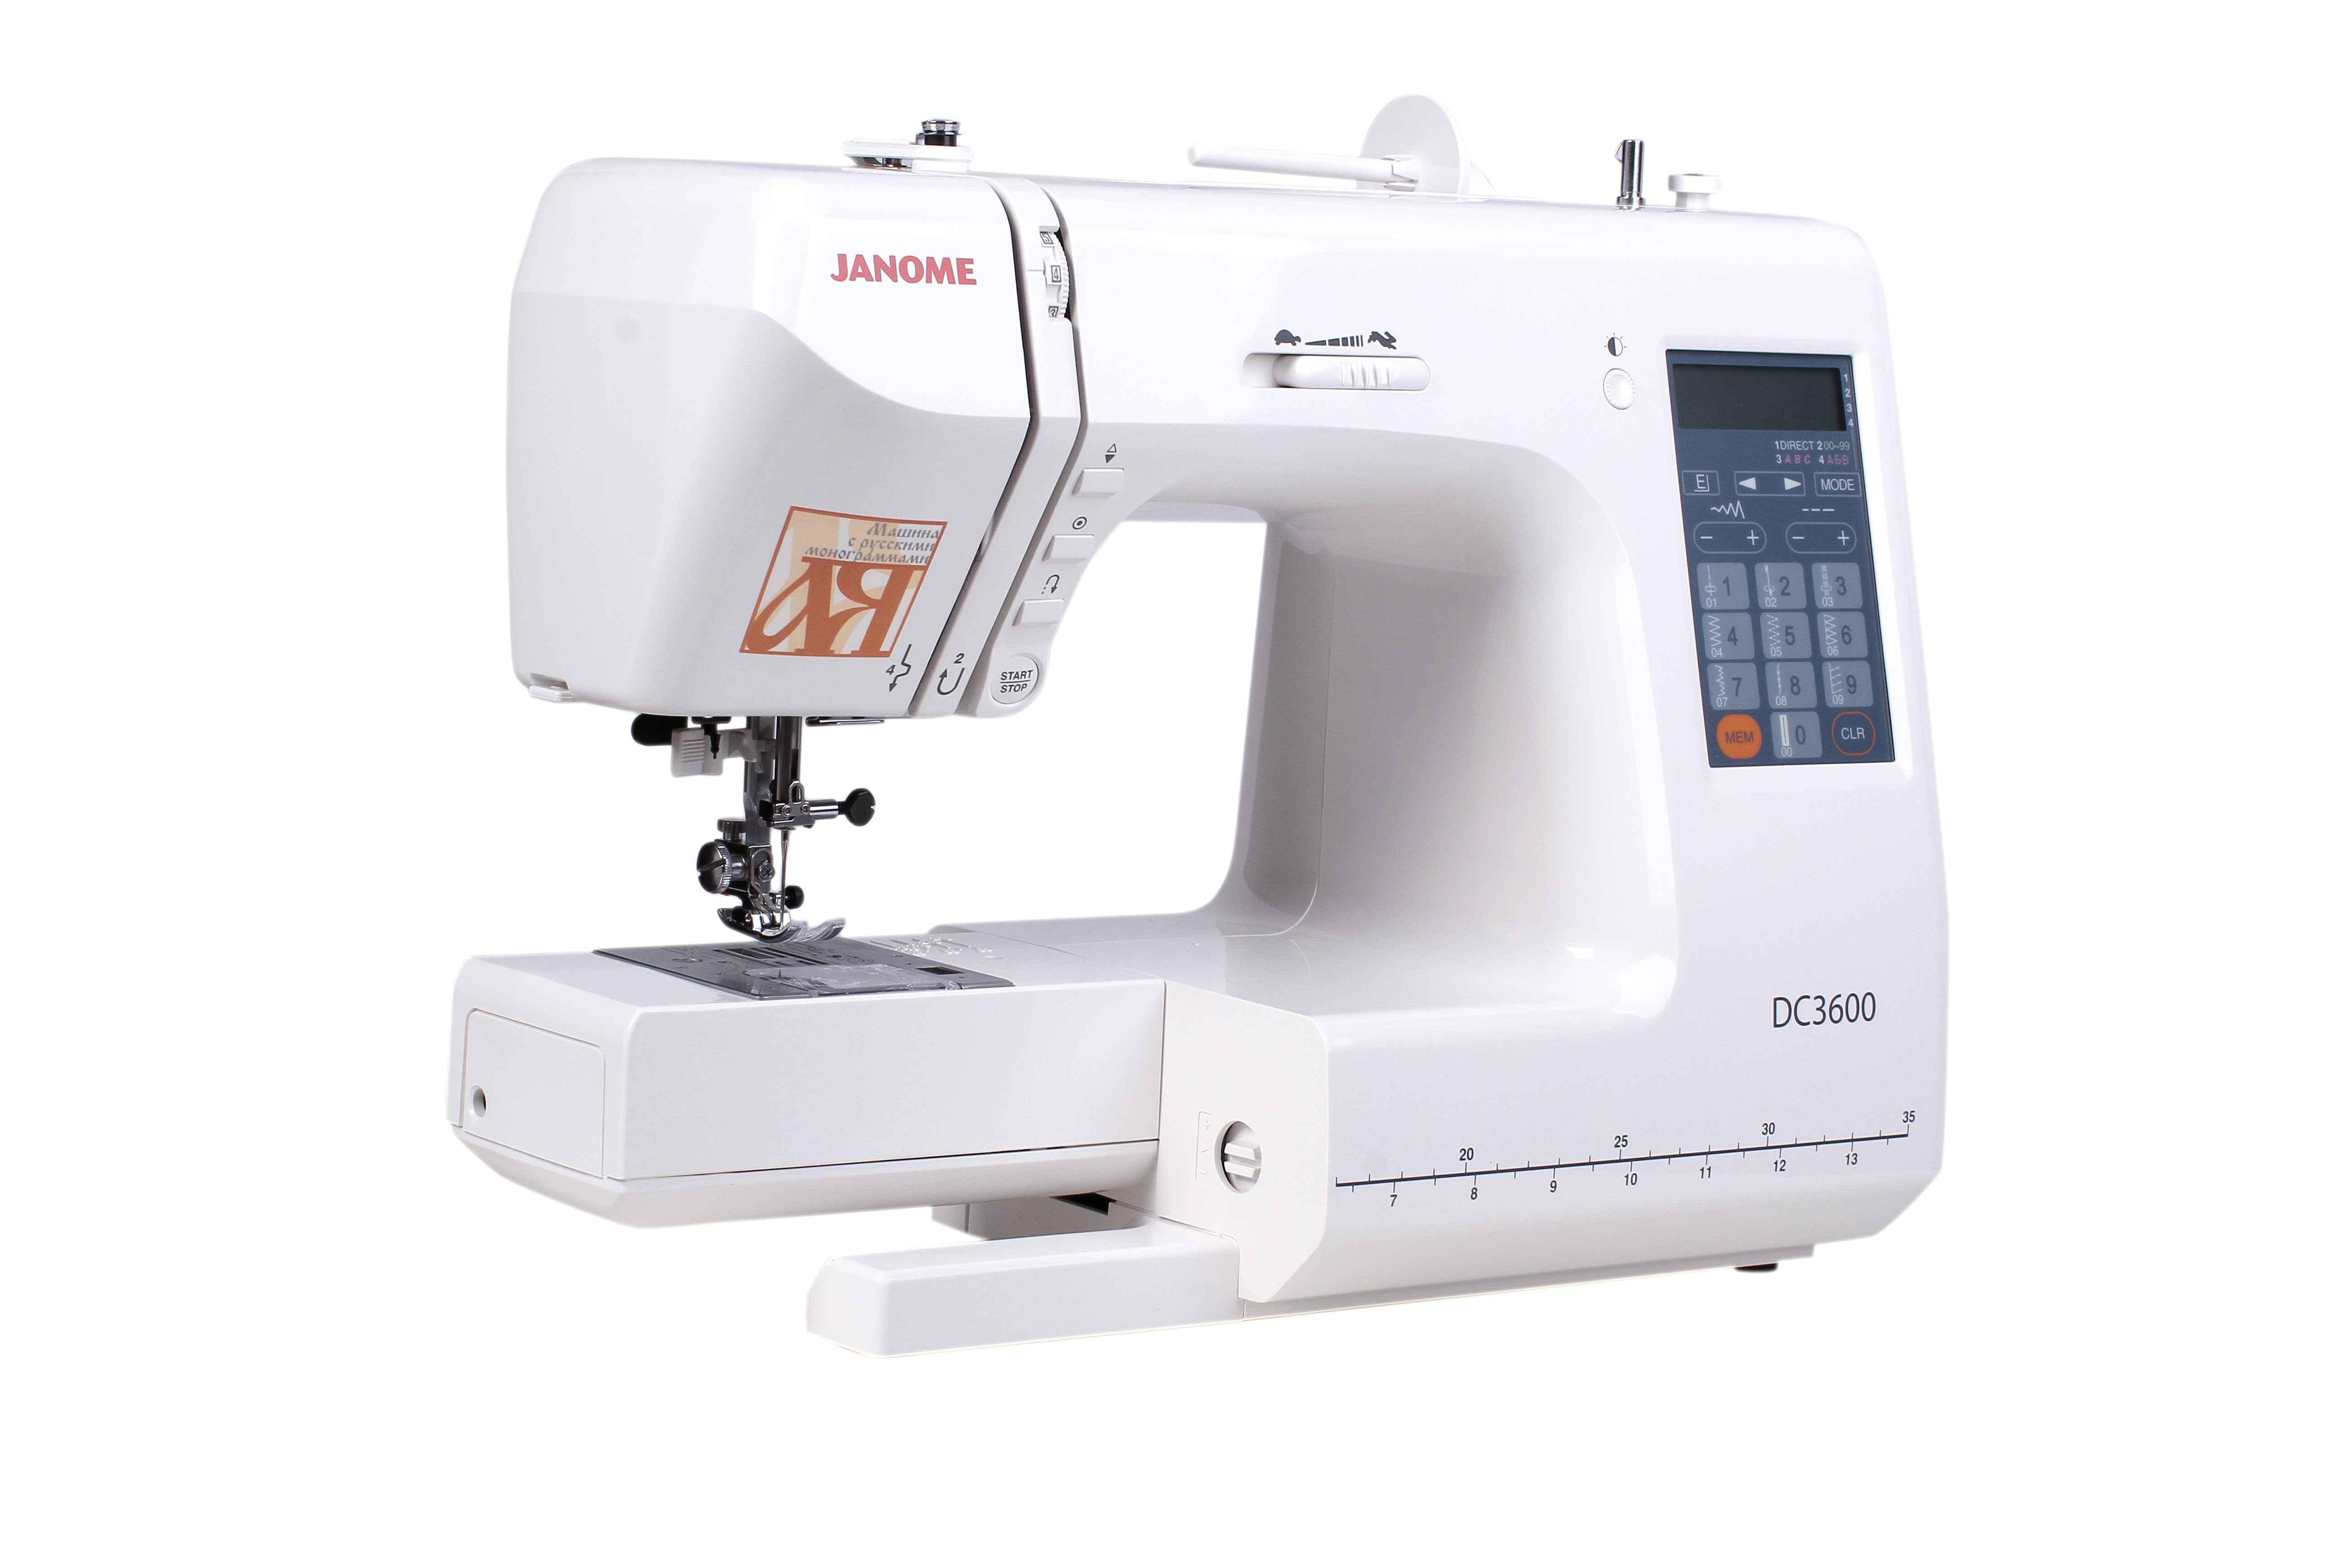 Швейная машина Janome Decor Computer 3600 (DC 3600)